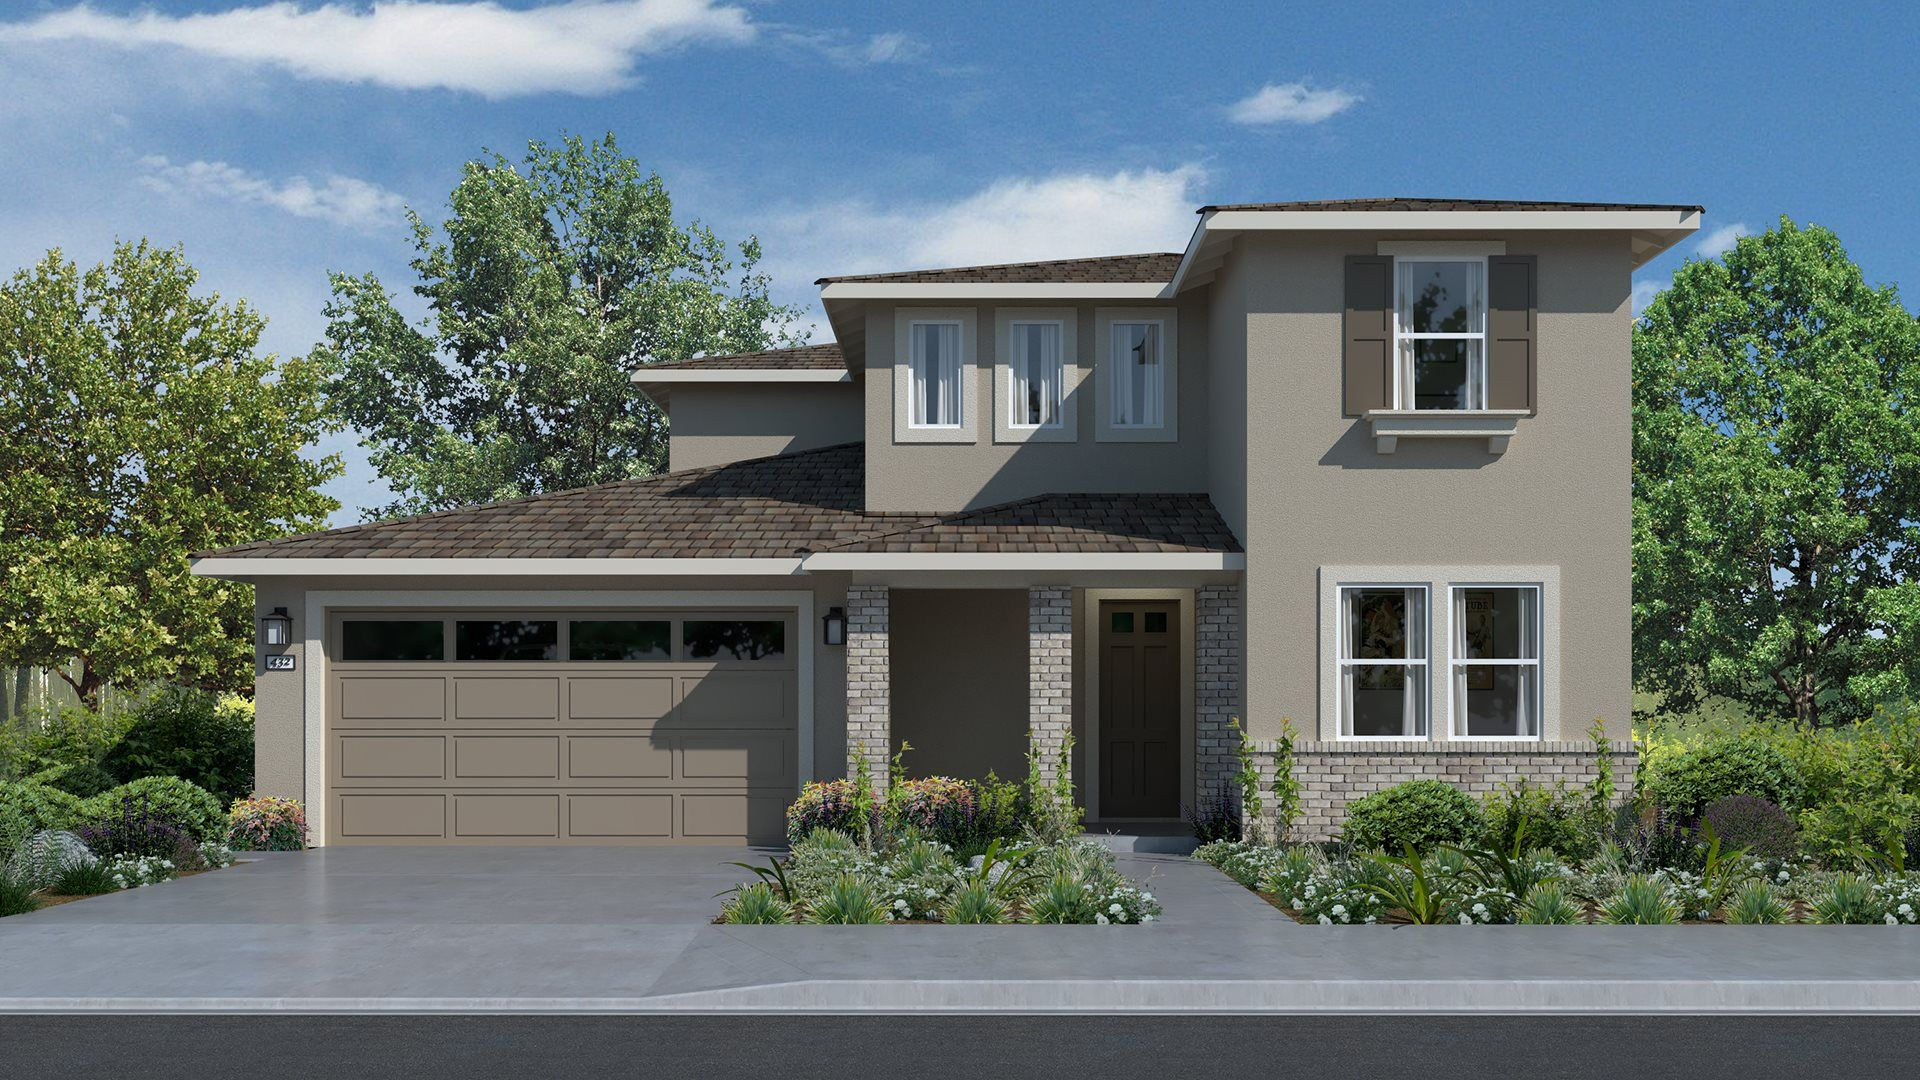 Crestvue at Northlake Residence 2268